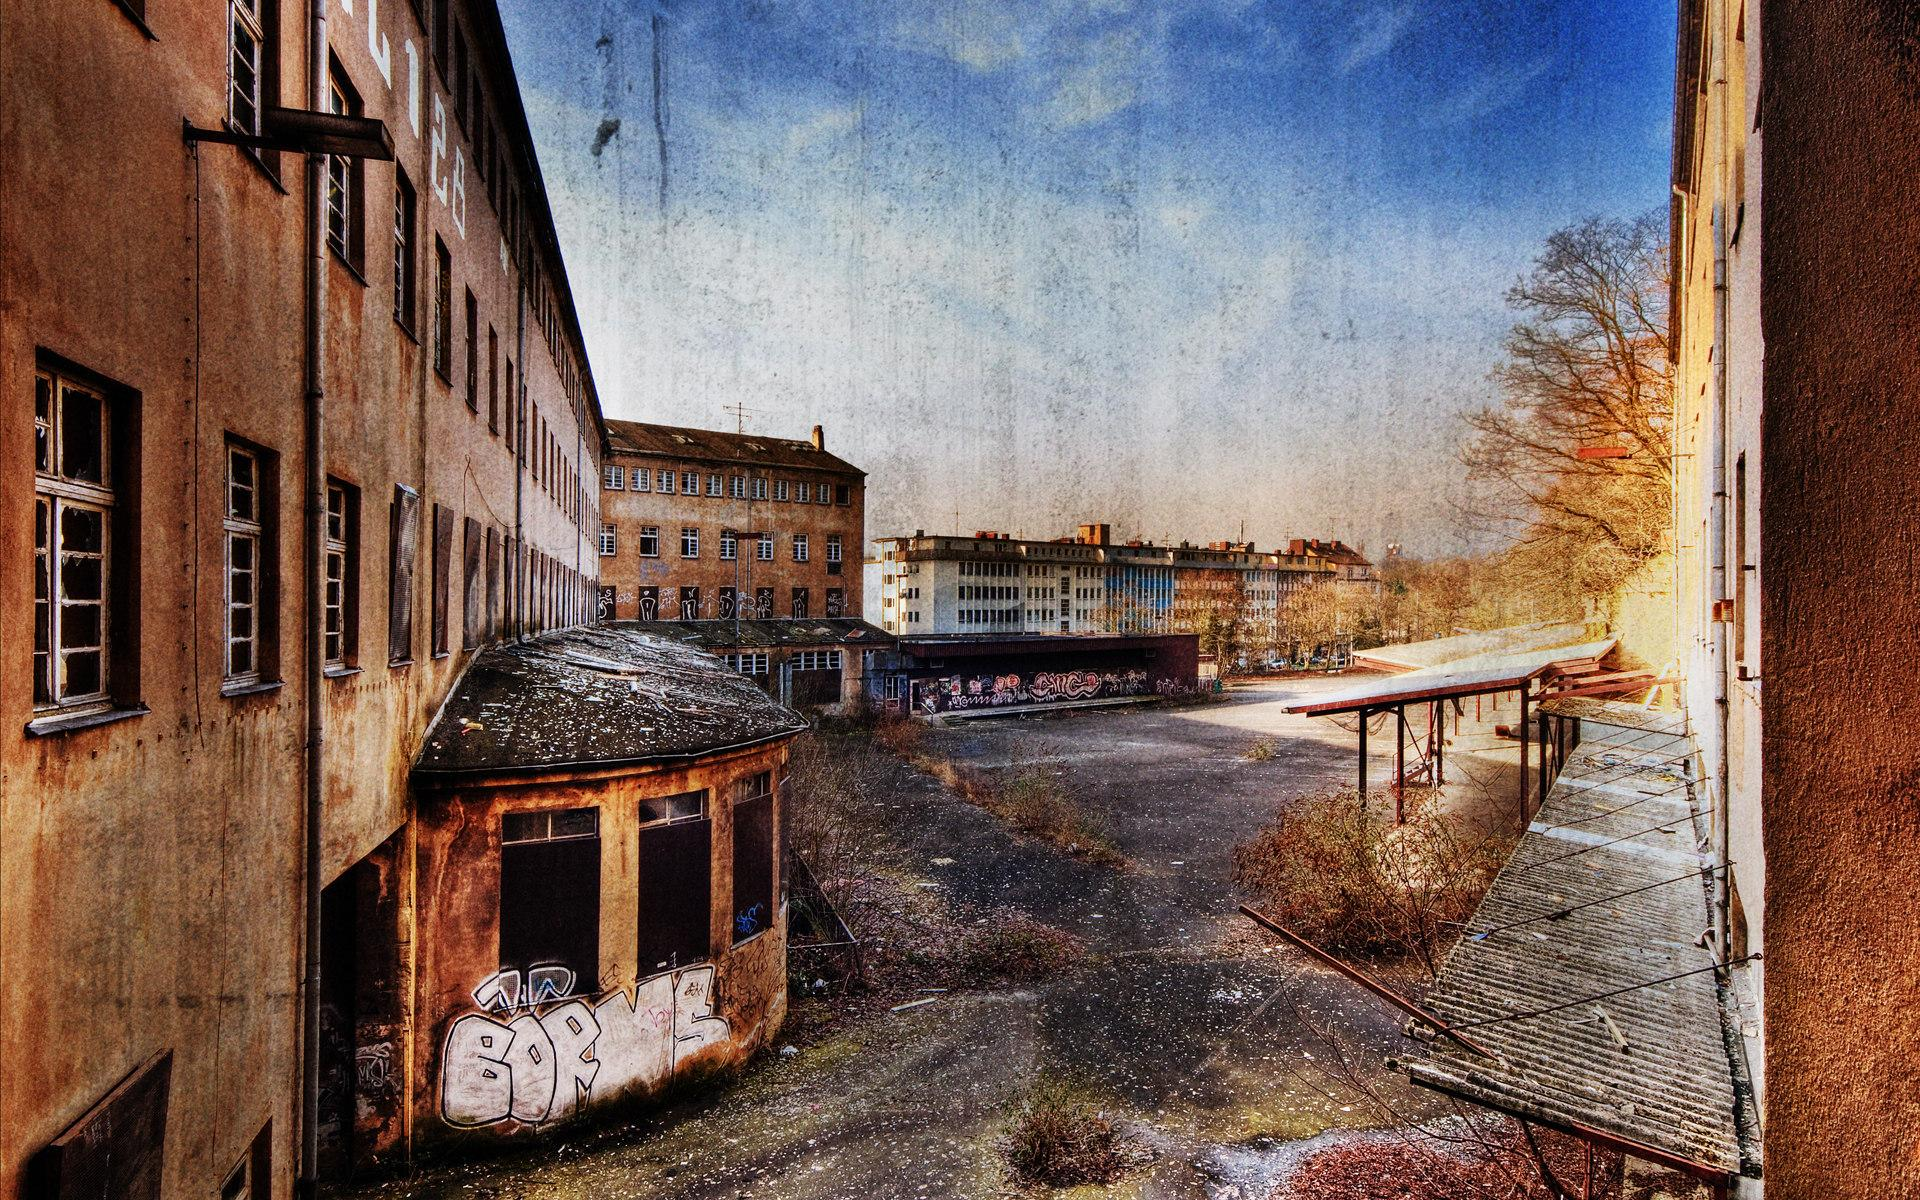 urban-ruins-and-abandoned-buildings_1920x1200_82666.jpg (JPEG-Grafik, 1920×1200 Pixel) - Skaliert (51%)